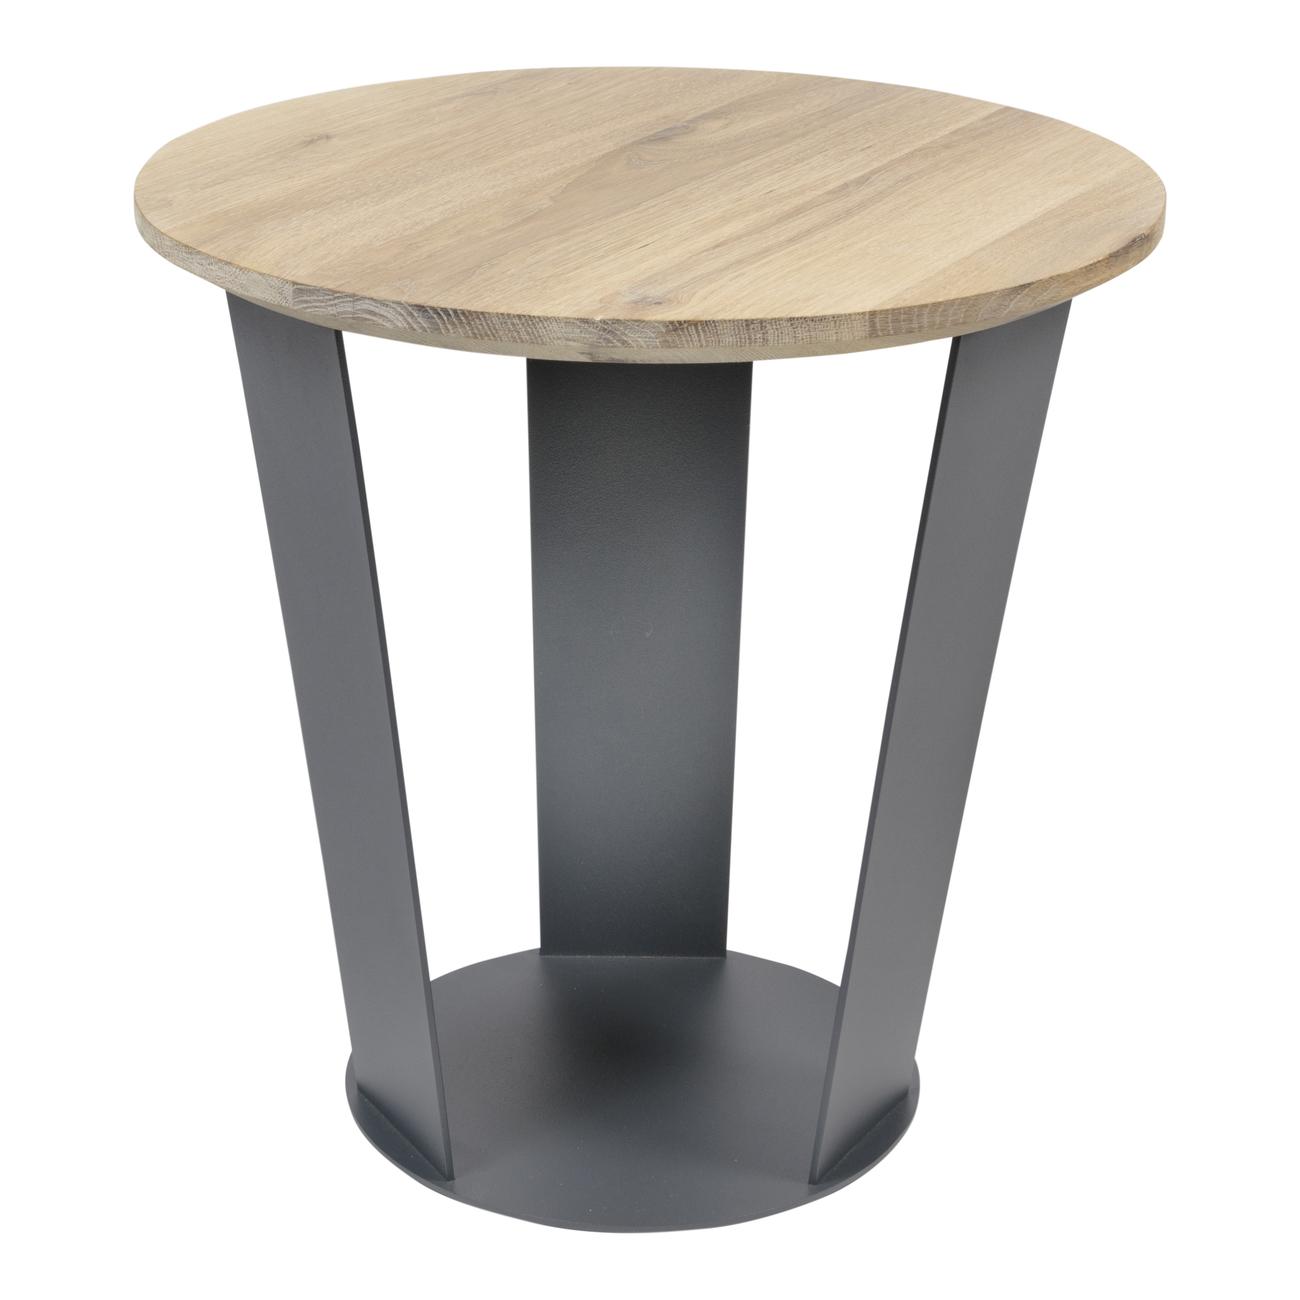 Torna Design Shine bijzettafel ø 38 cm